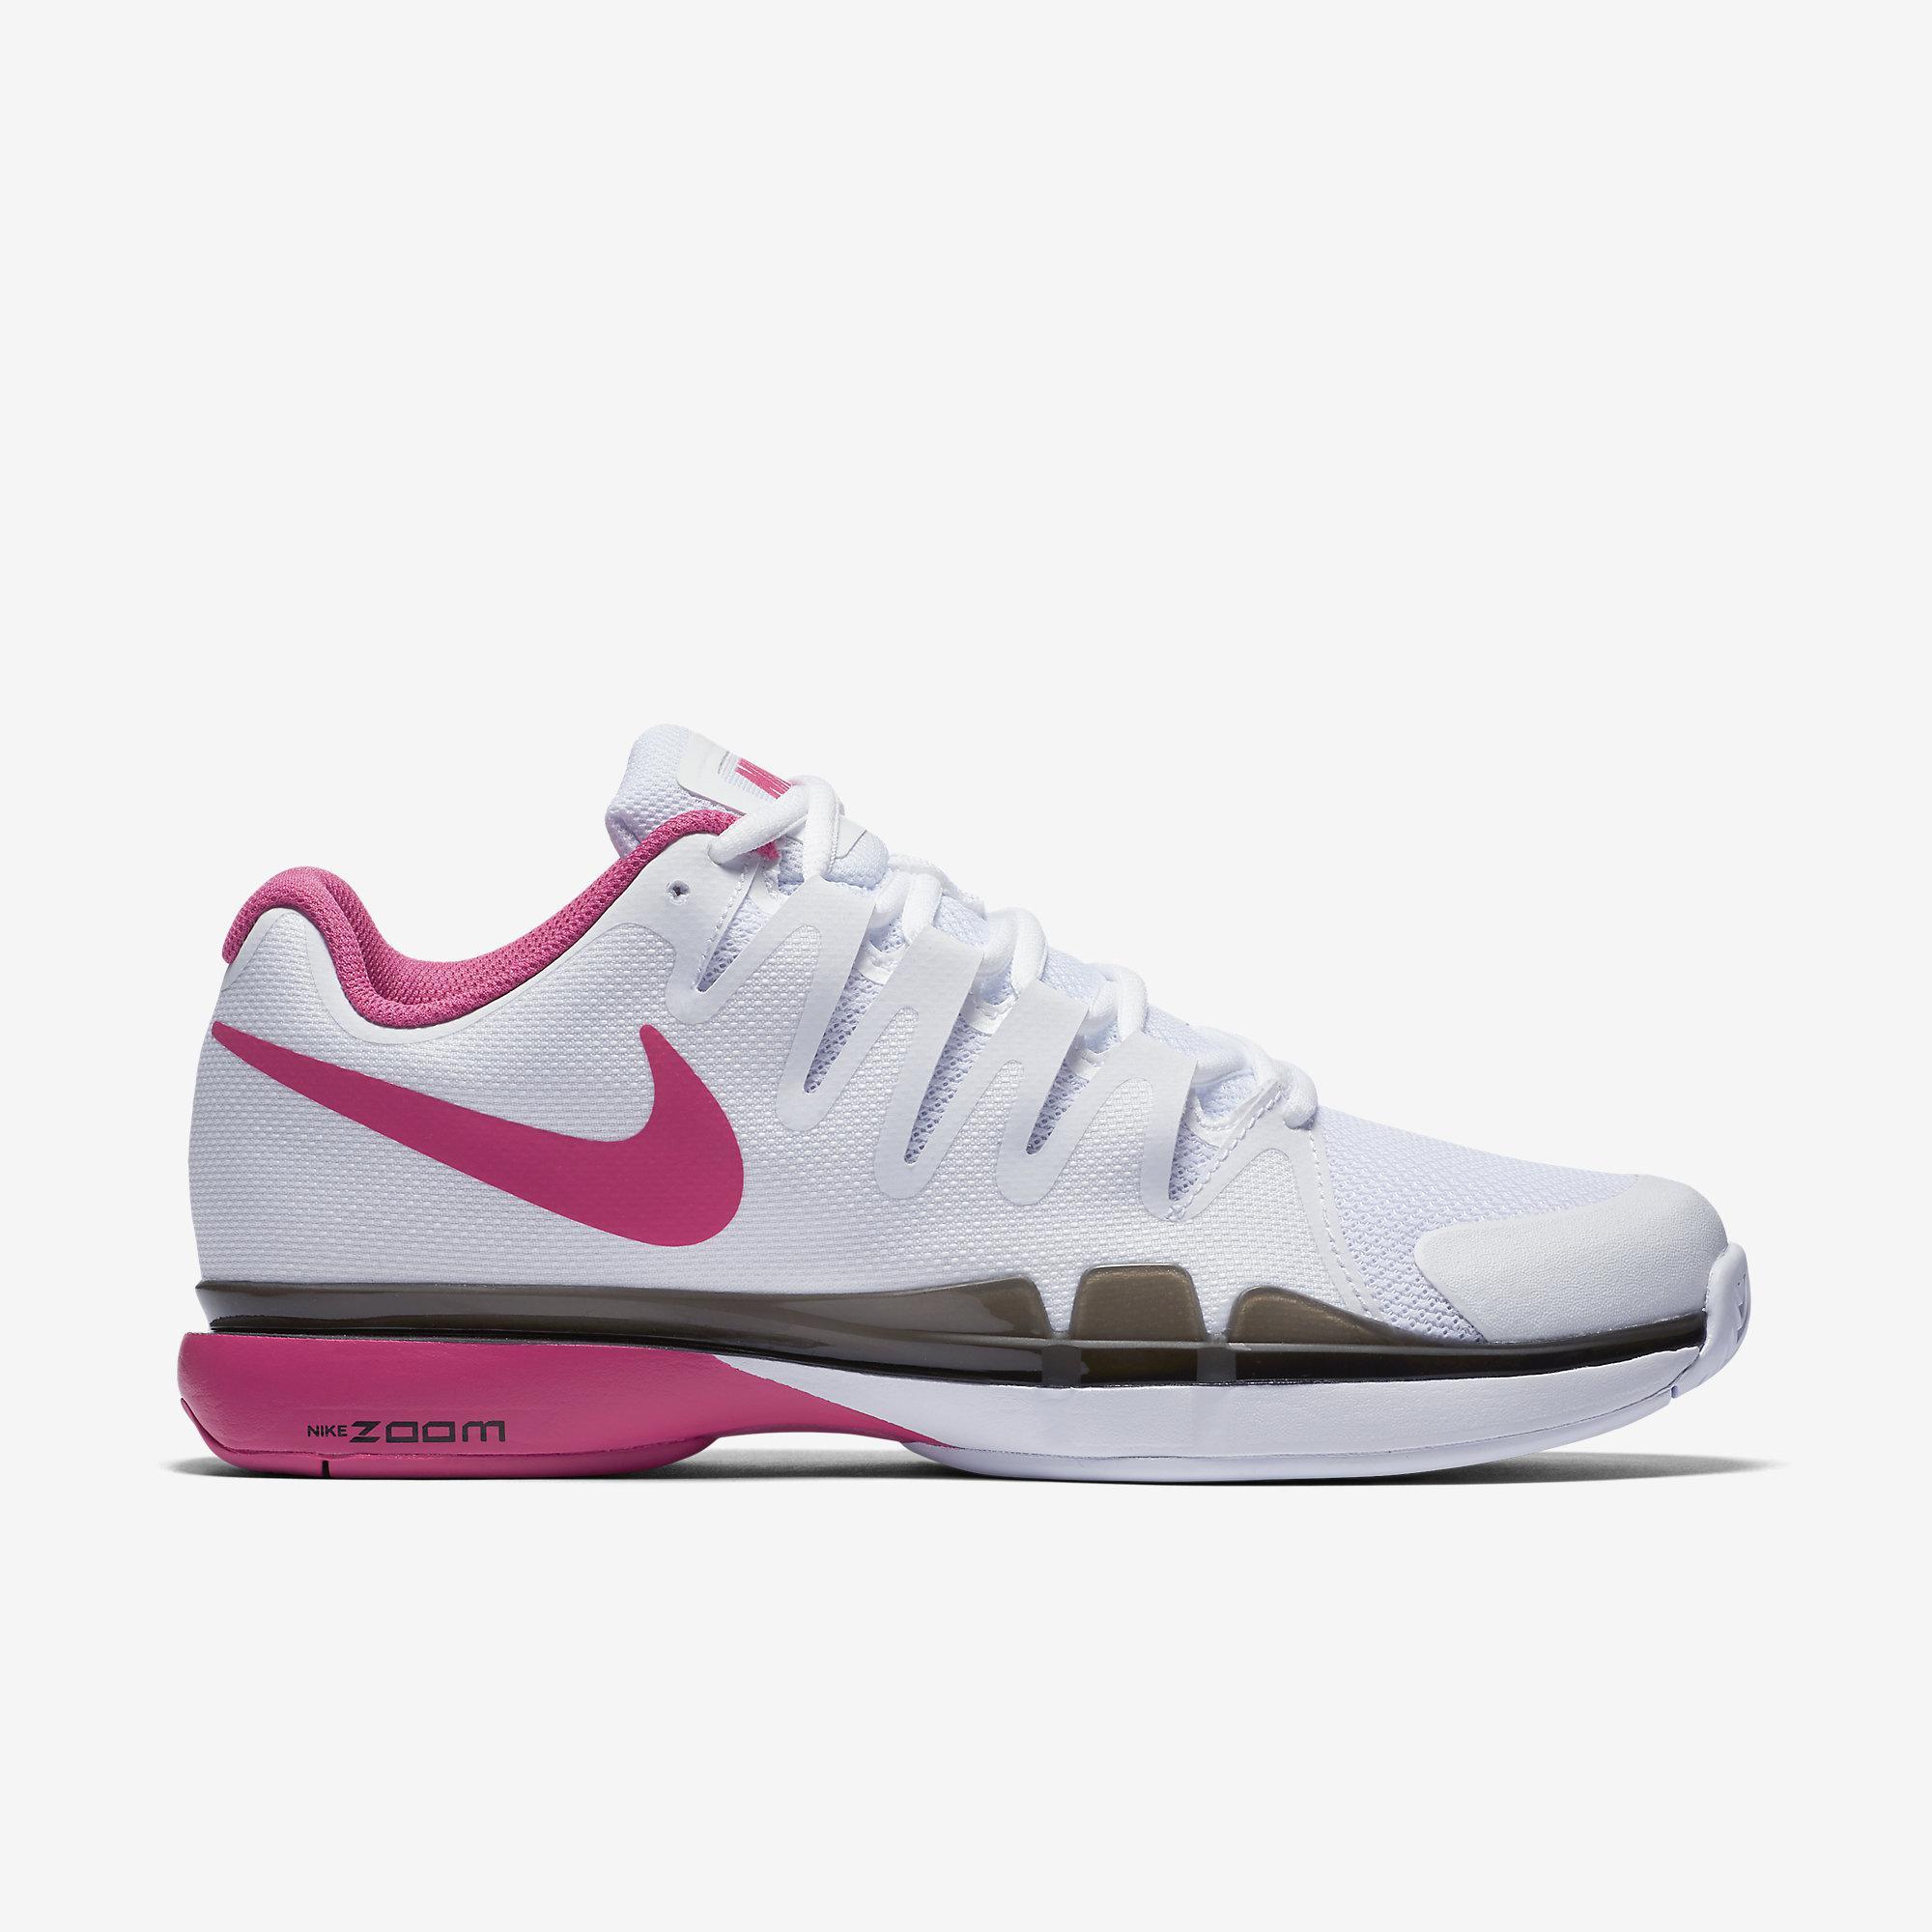 Nike Womens Zoom Vapor 9.5 Tennis Shoes - White/Pink